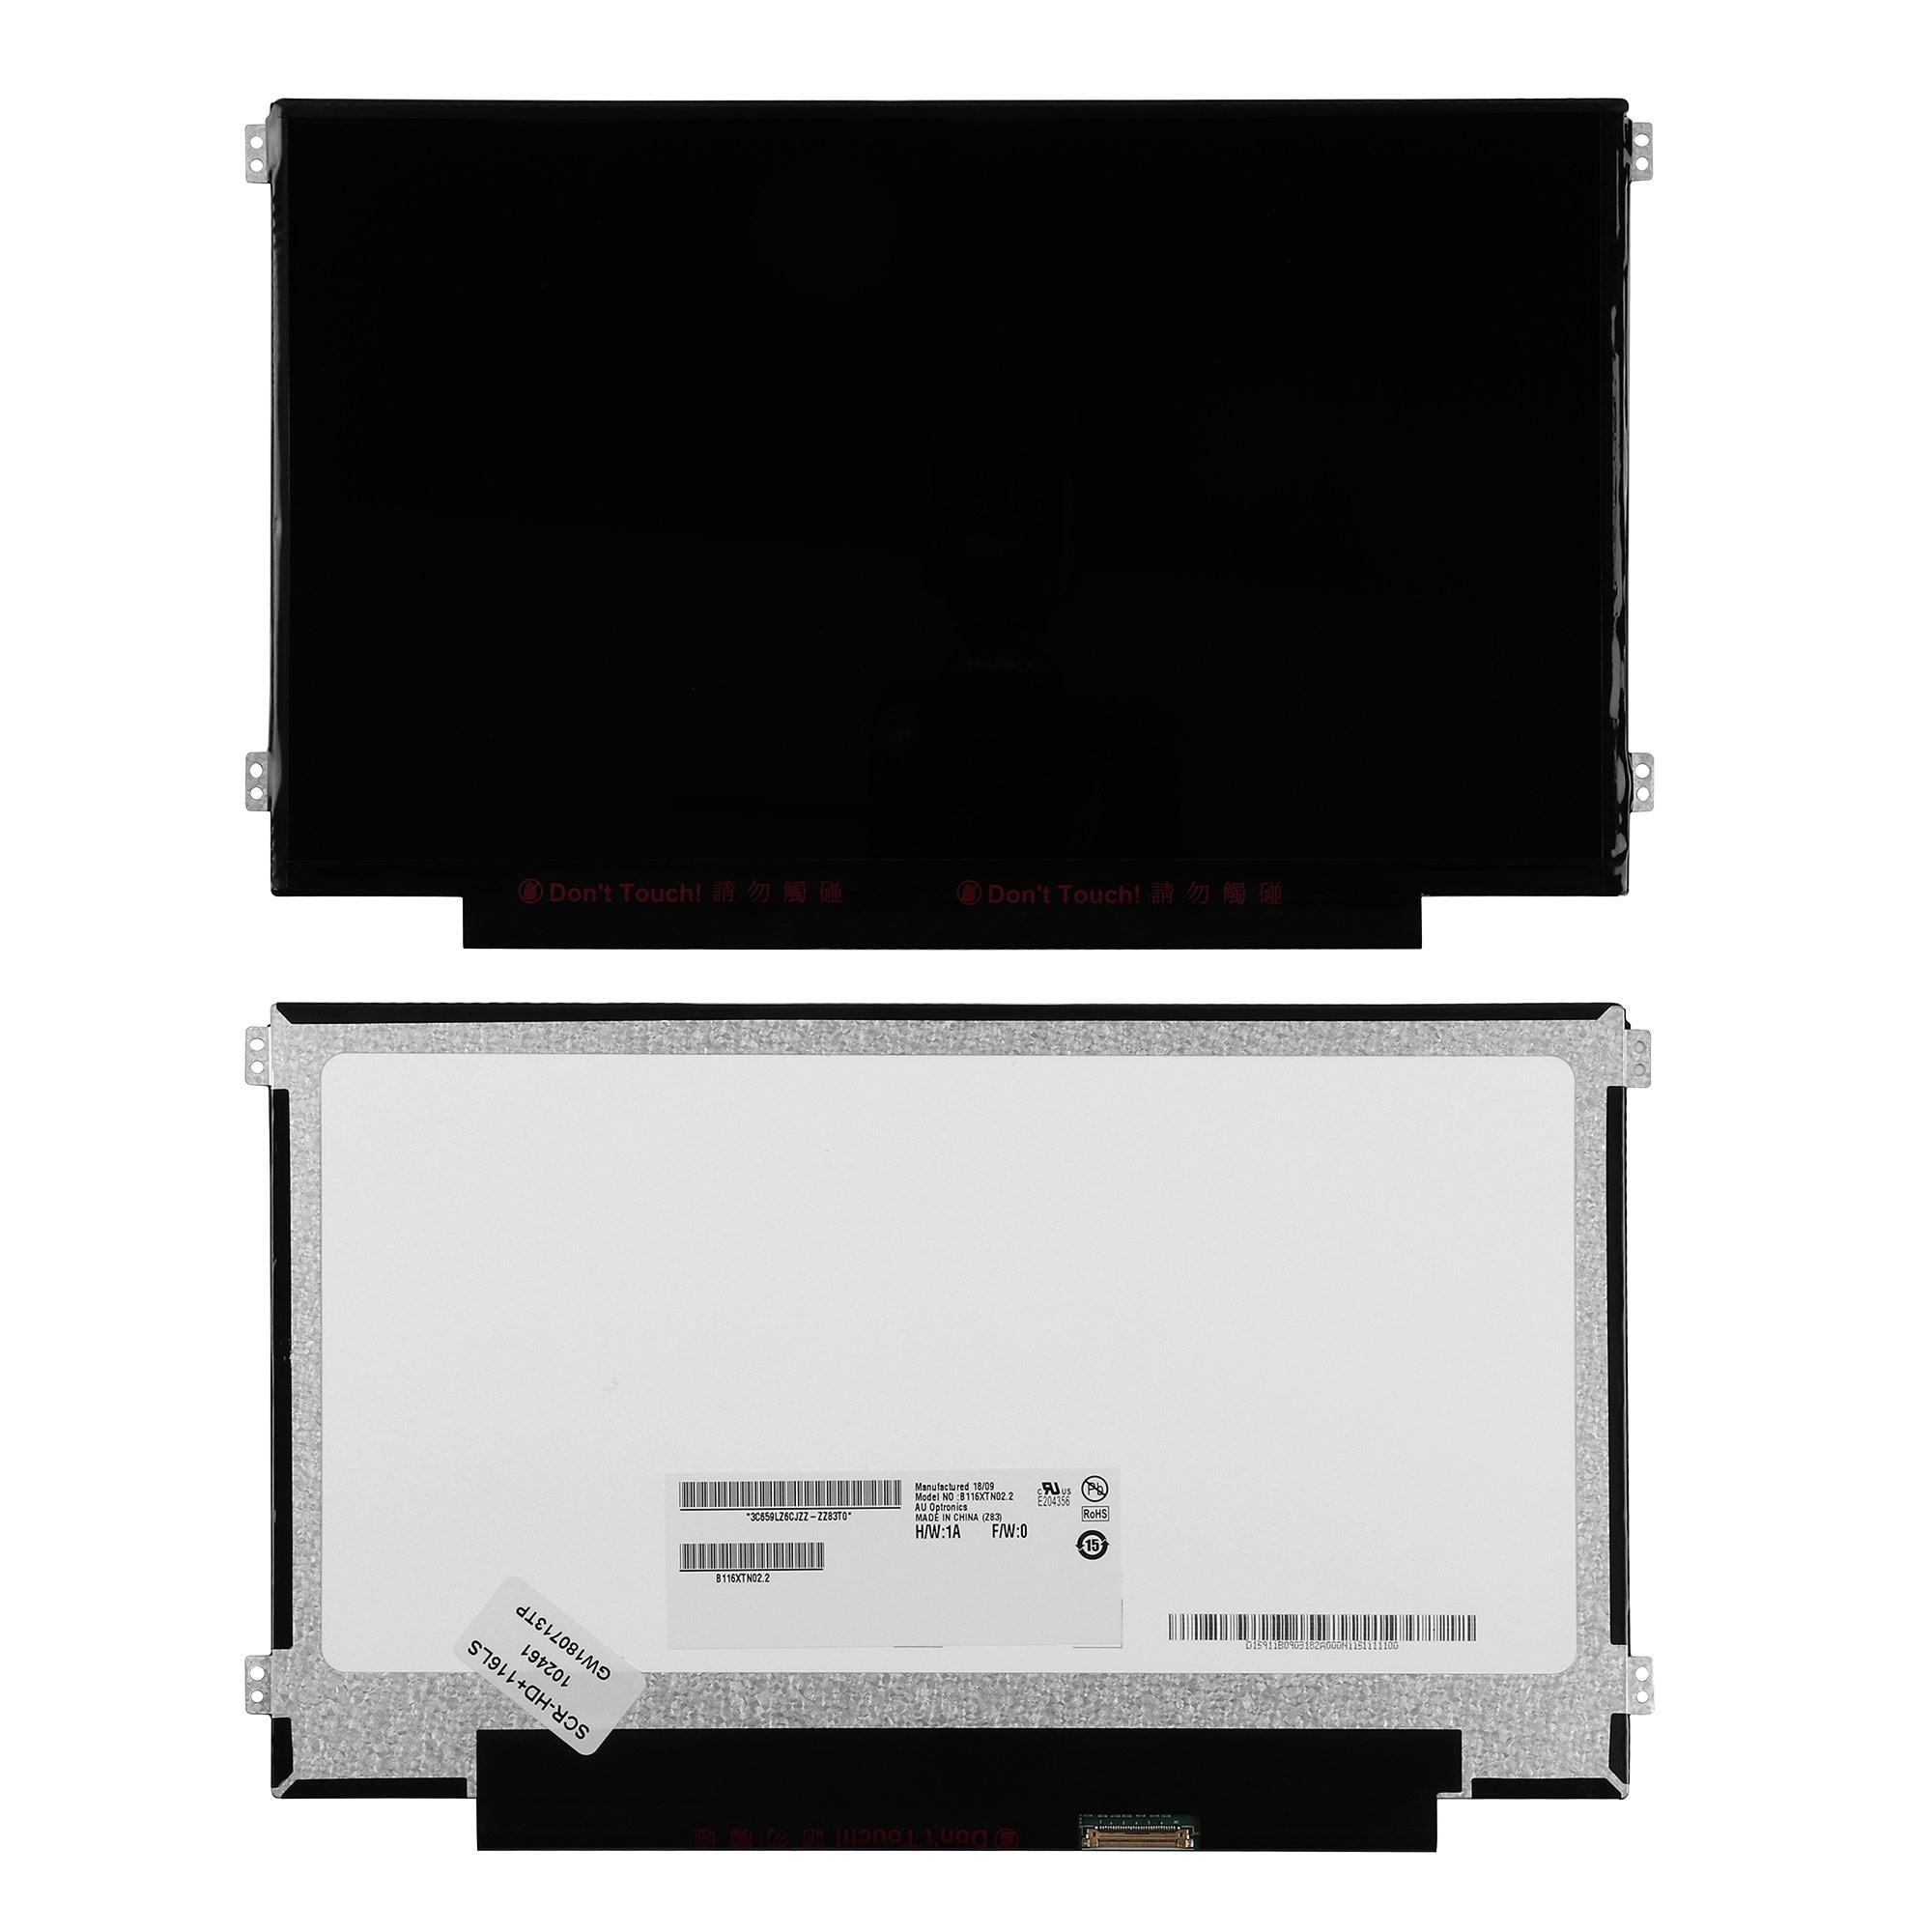 Запчасти для ремонта теле, видео, аудио 11.6 1366x768 WXGA 40 pin Slim LED крепления слева/справа (уши). PN: B116XTN02.2.